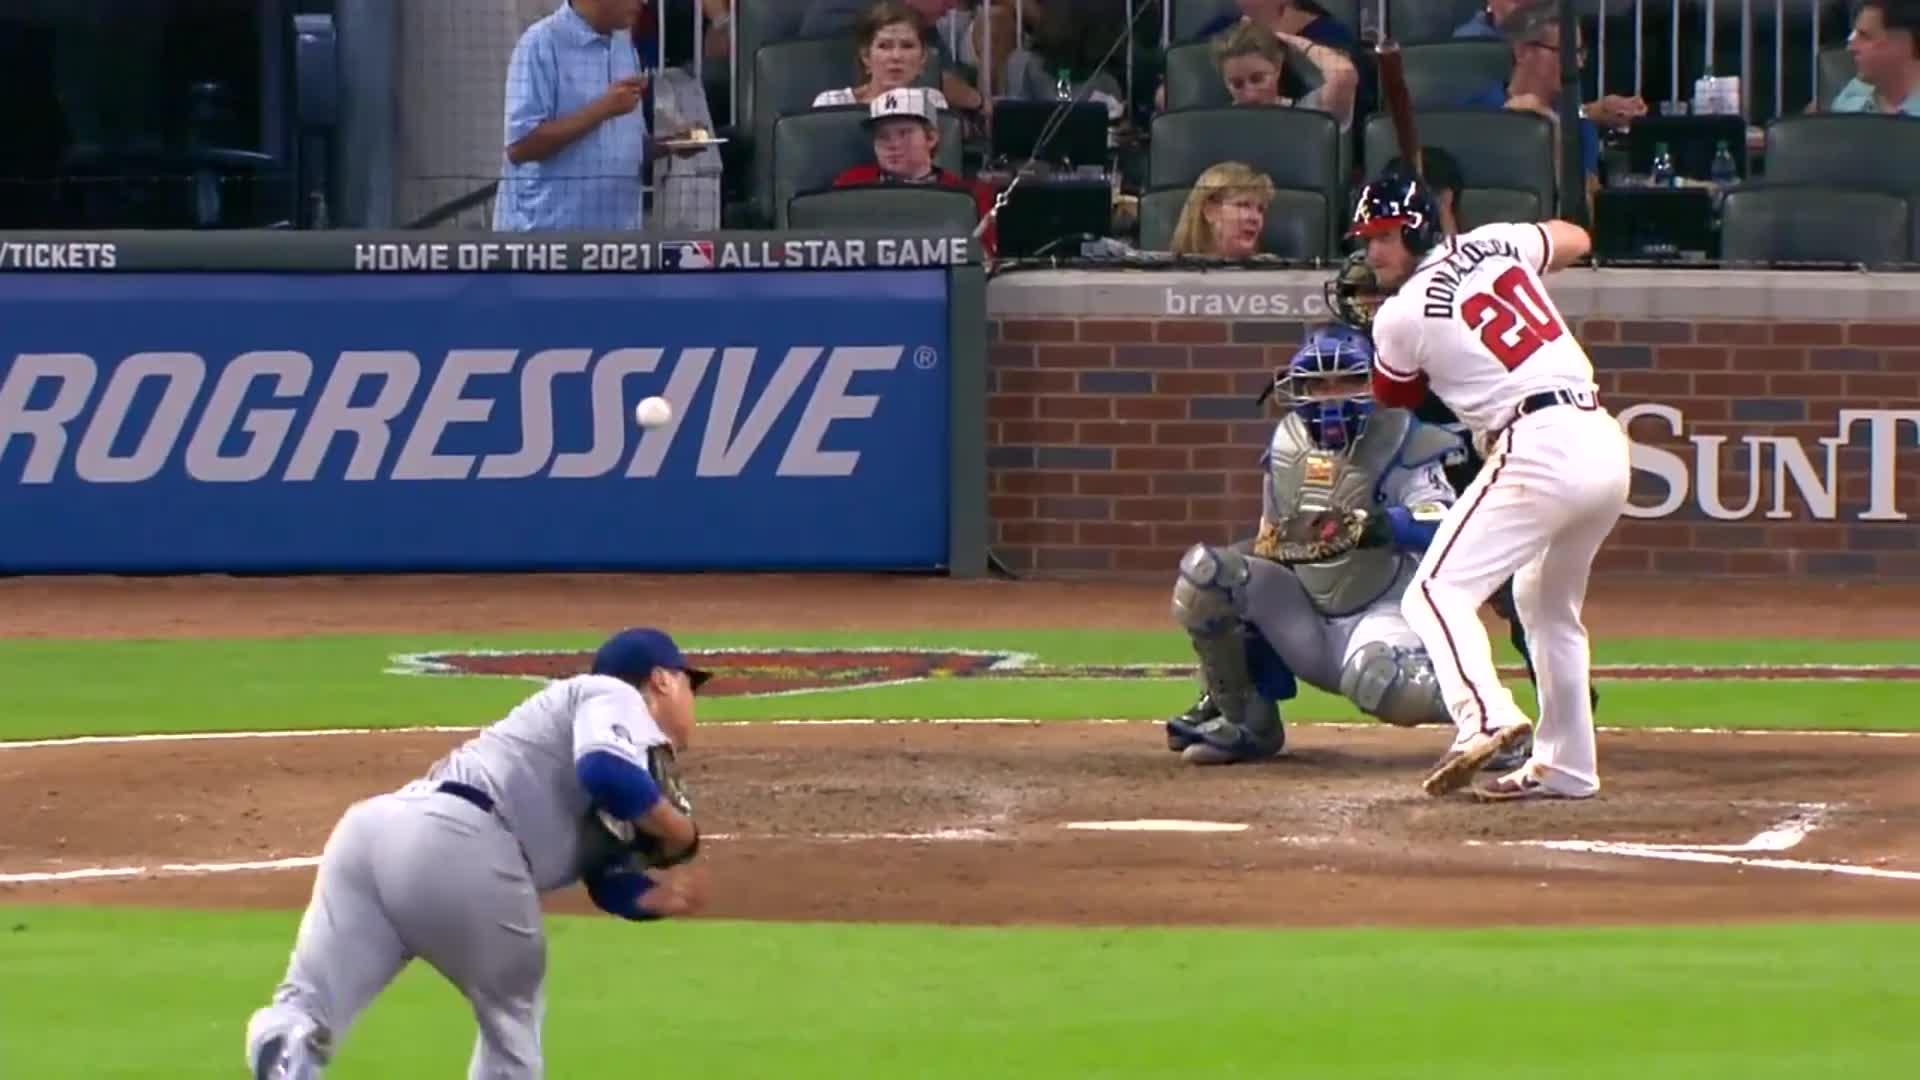 Josh Donaldson Admires His Home Run Gif By Handlit33 Gfycat